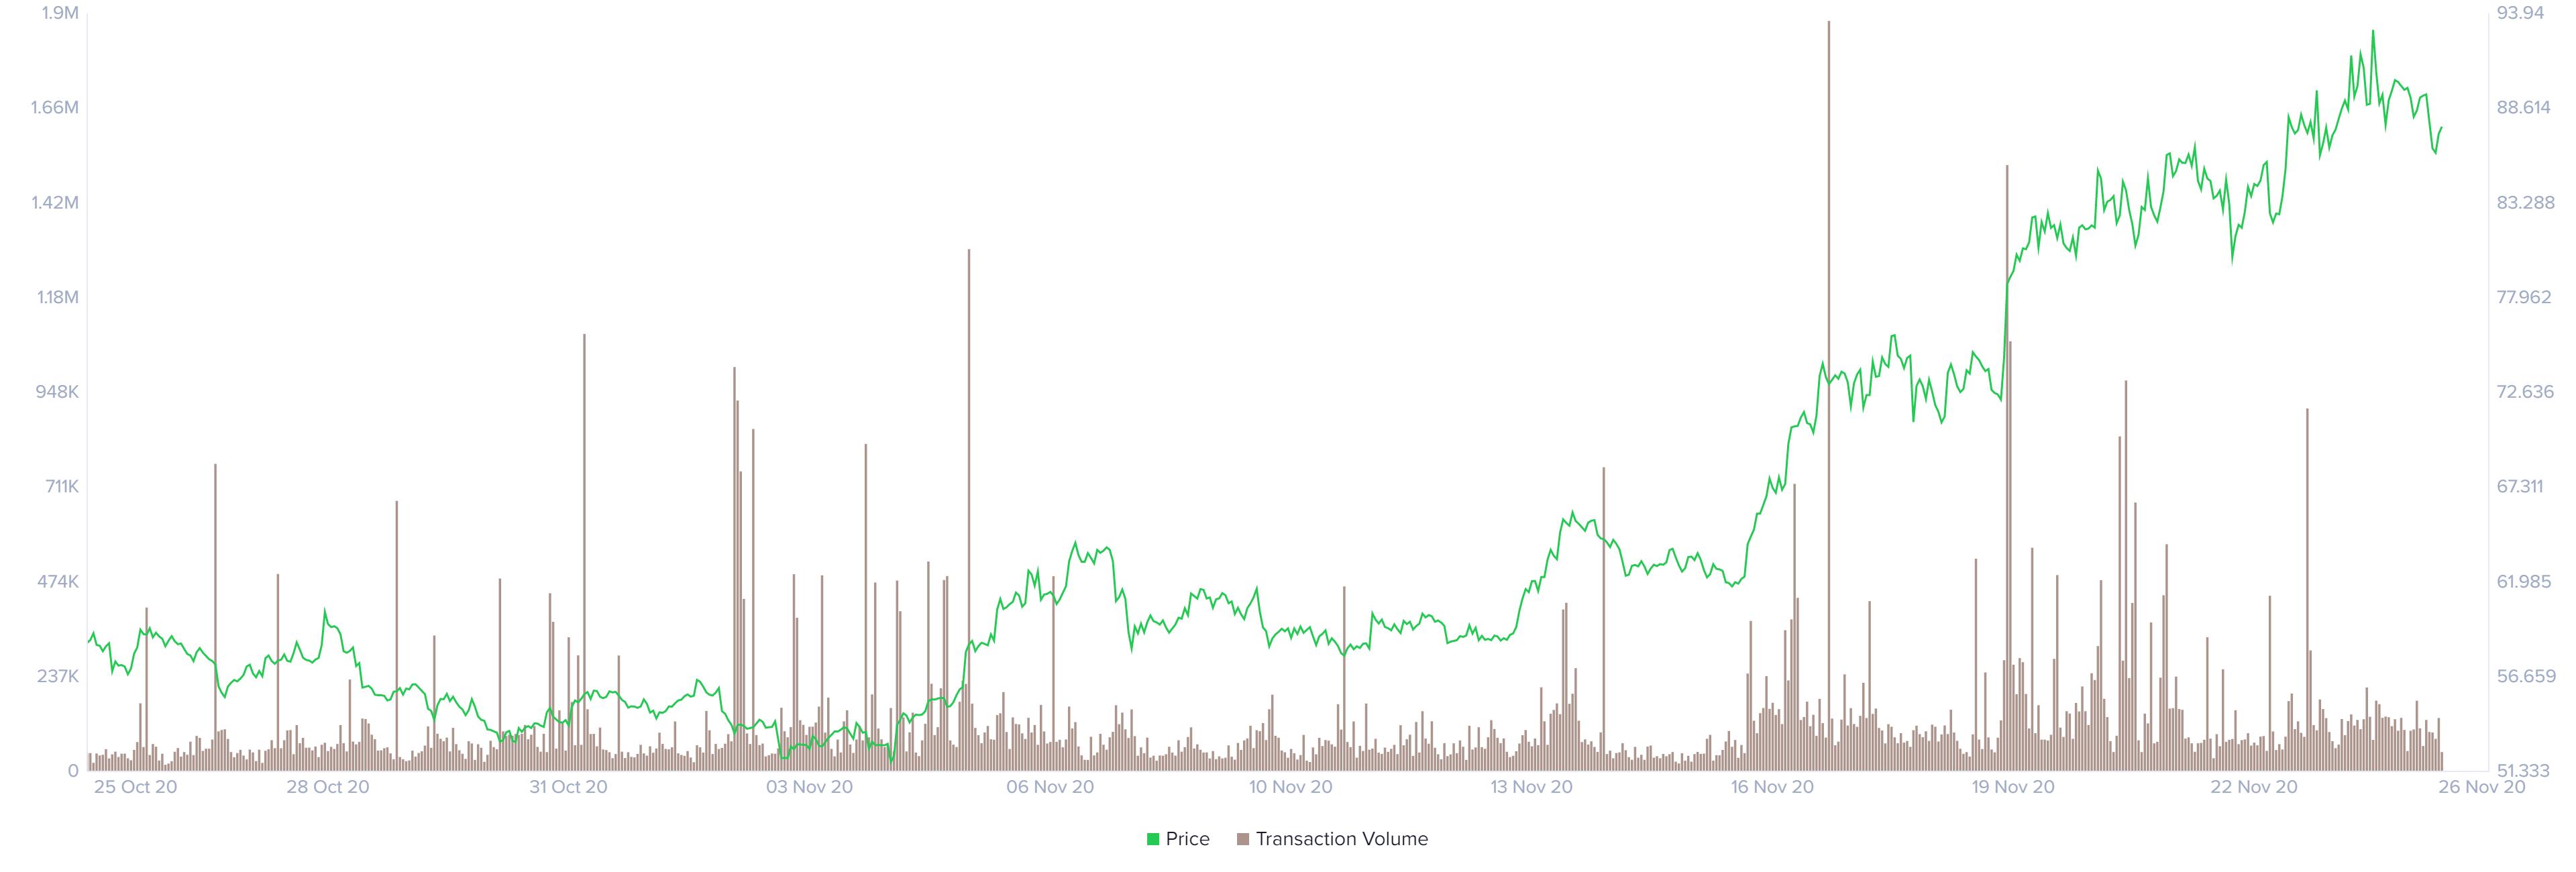 LTC daily transaction volume